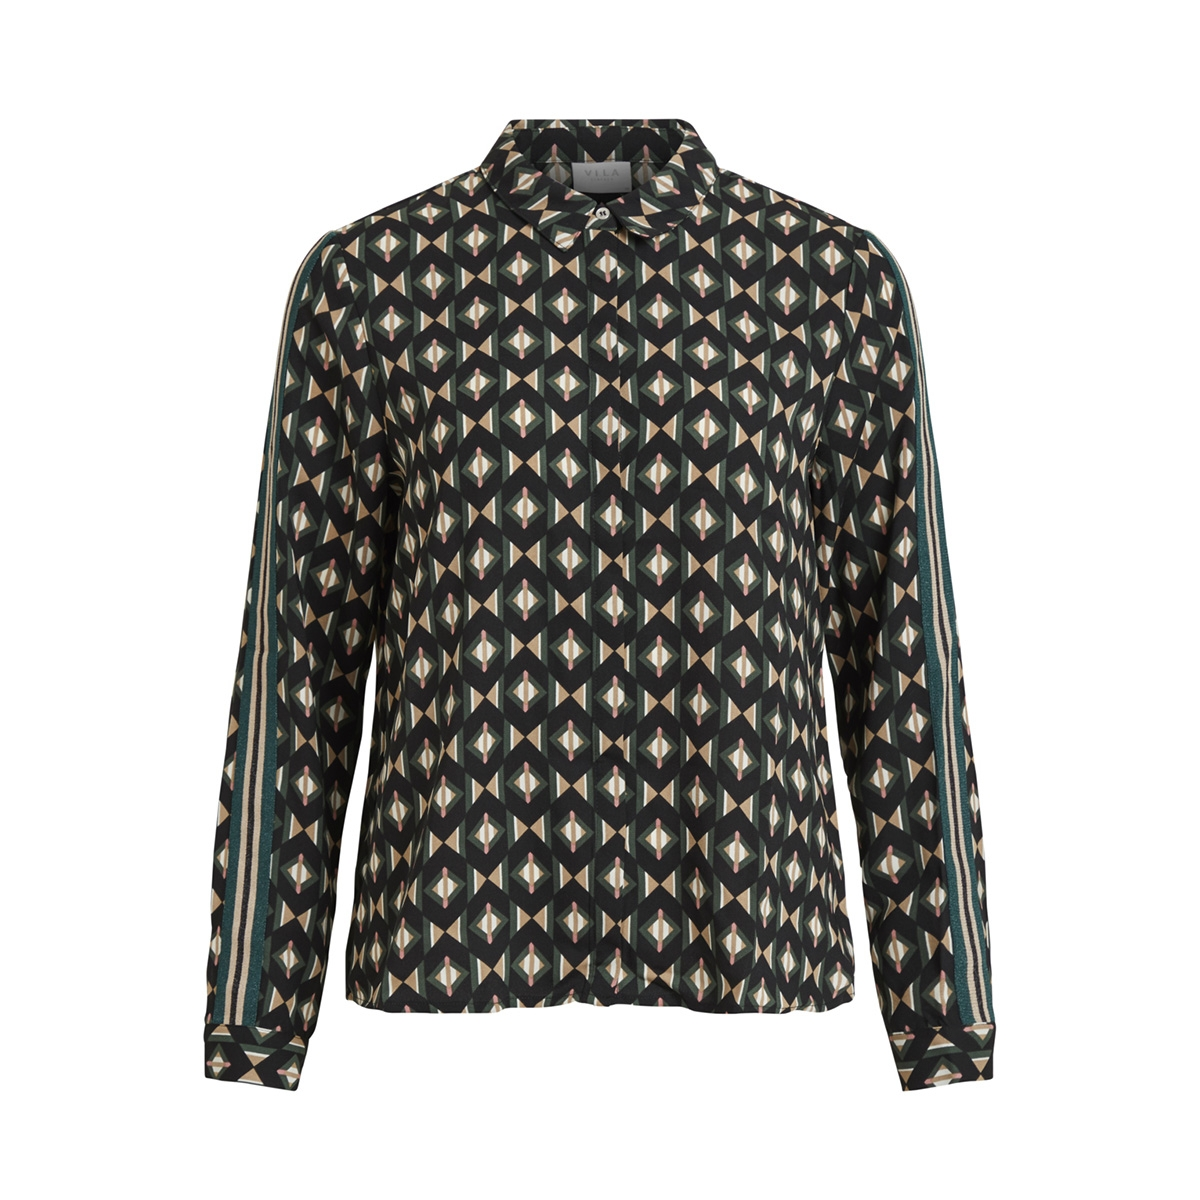 viretro l/s shirt 14051286 vila blouse garden topiary/grafic